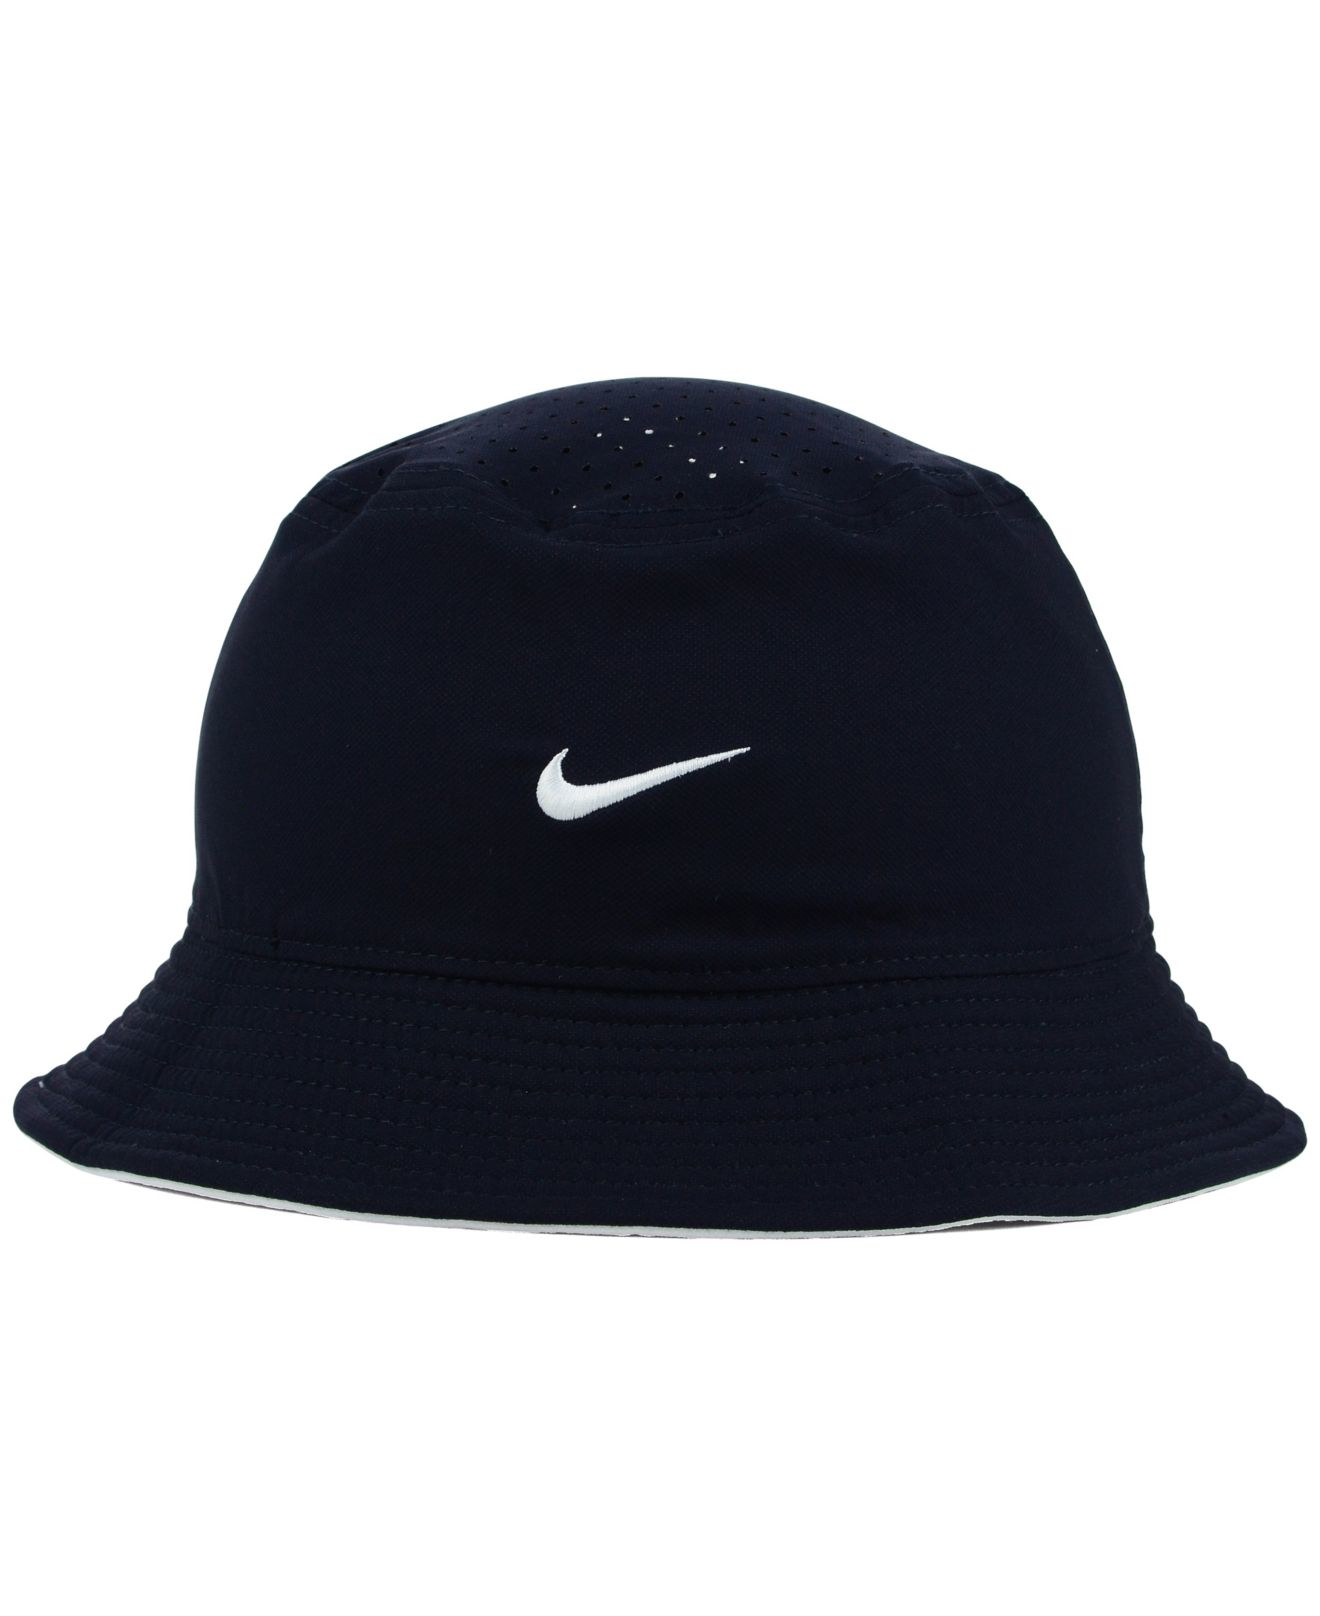 buy popular 8f652 43890 ... discount code for detroit tigers hats for men 868b3 d3043